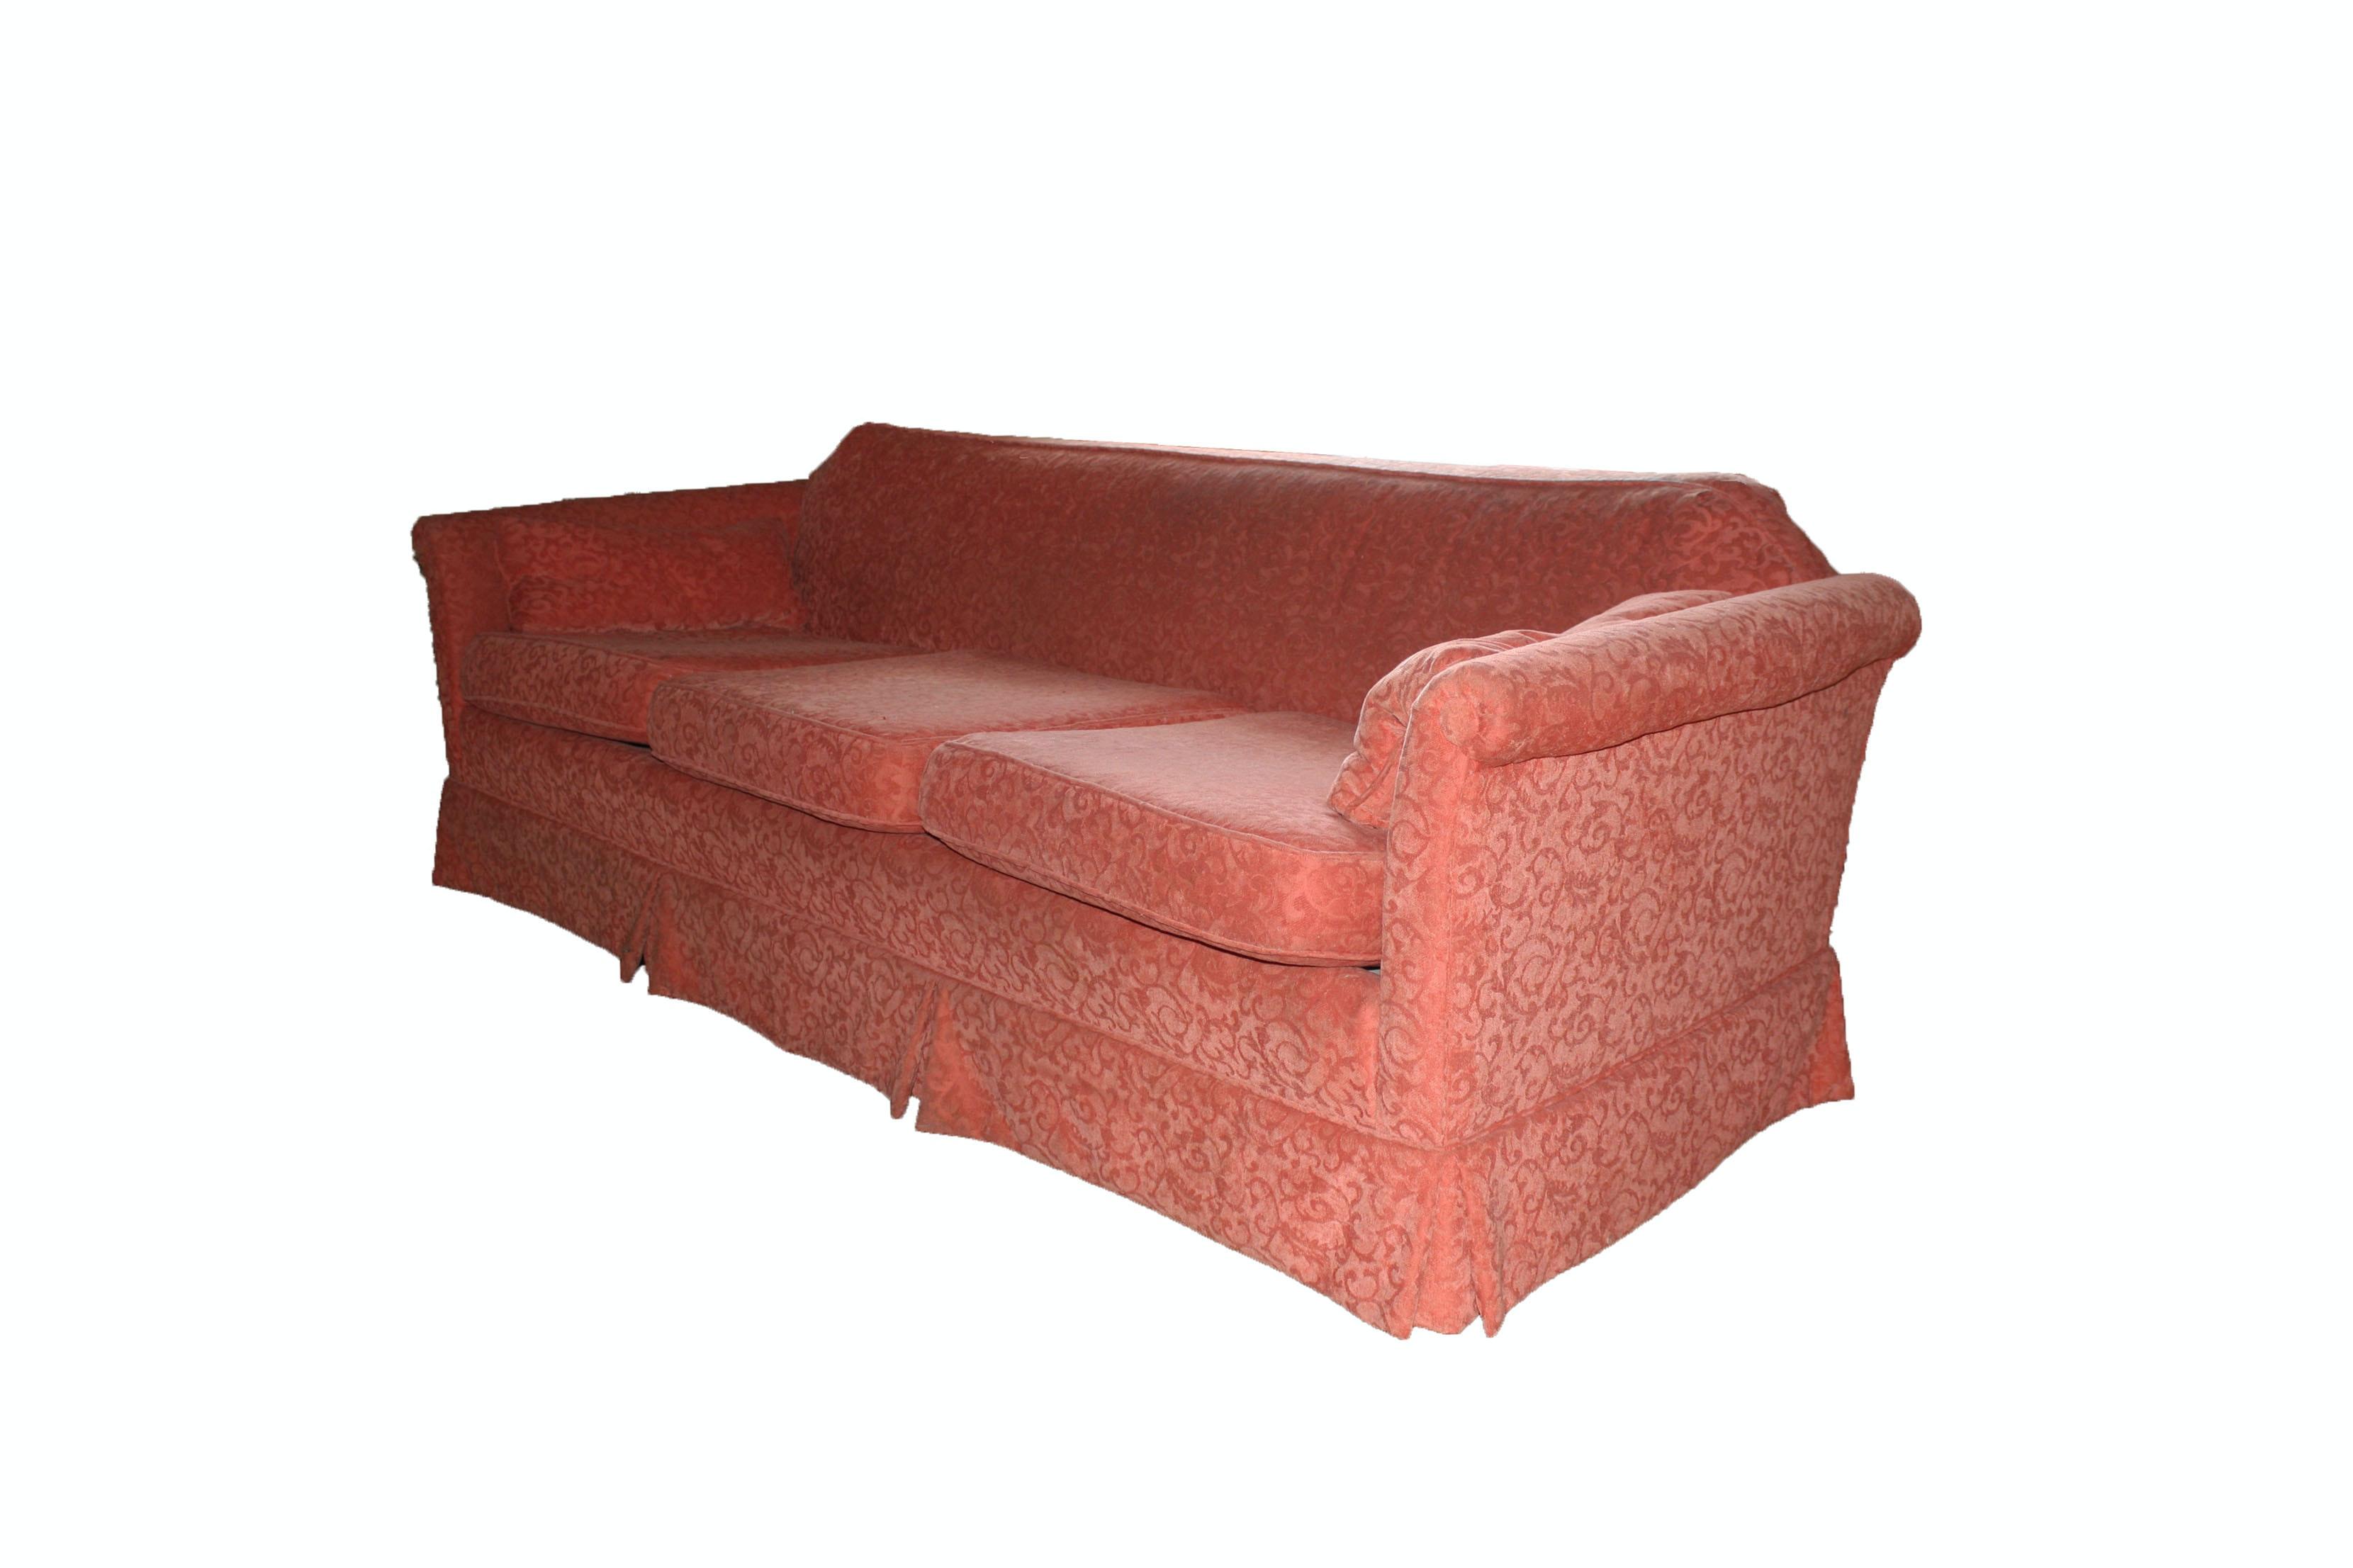 Coral Damask Upholstered Sofa